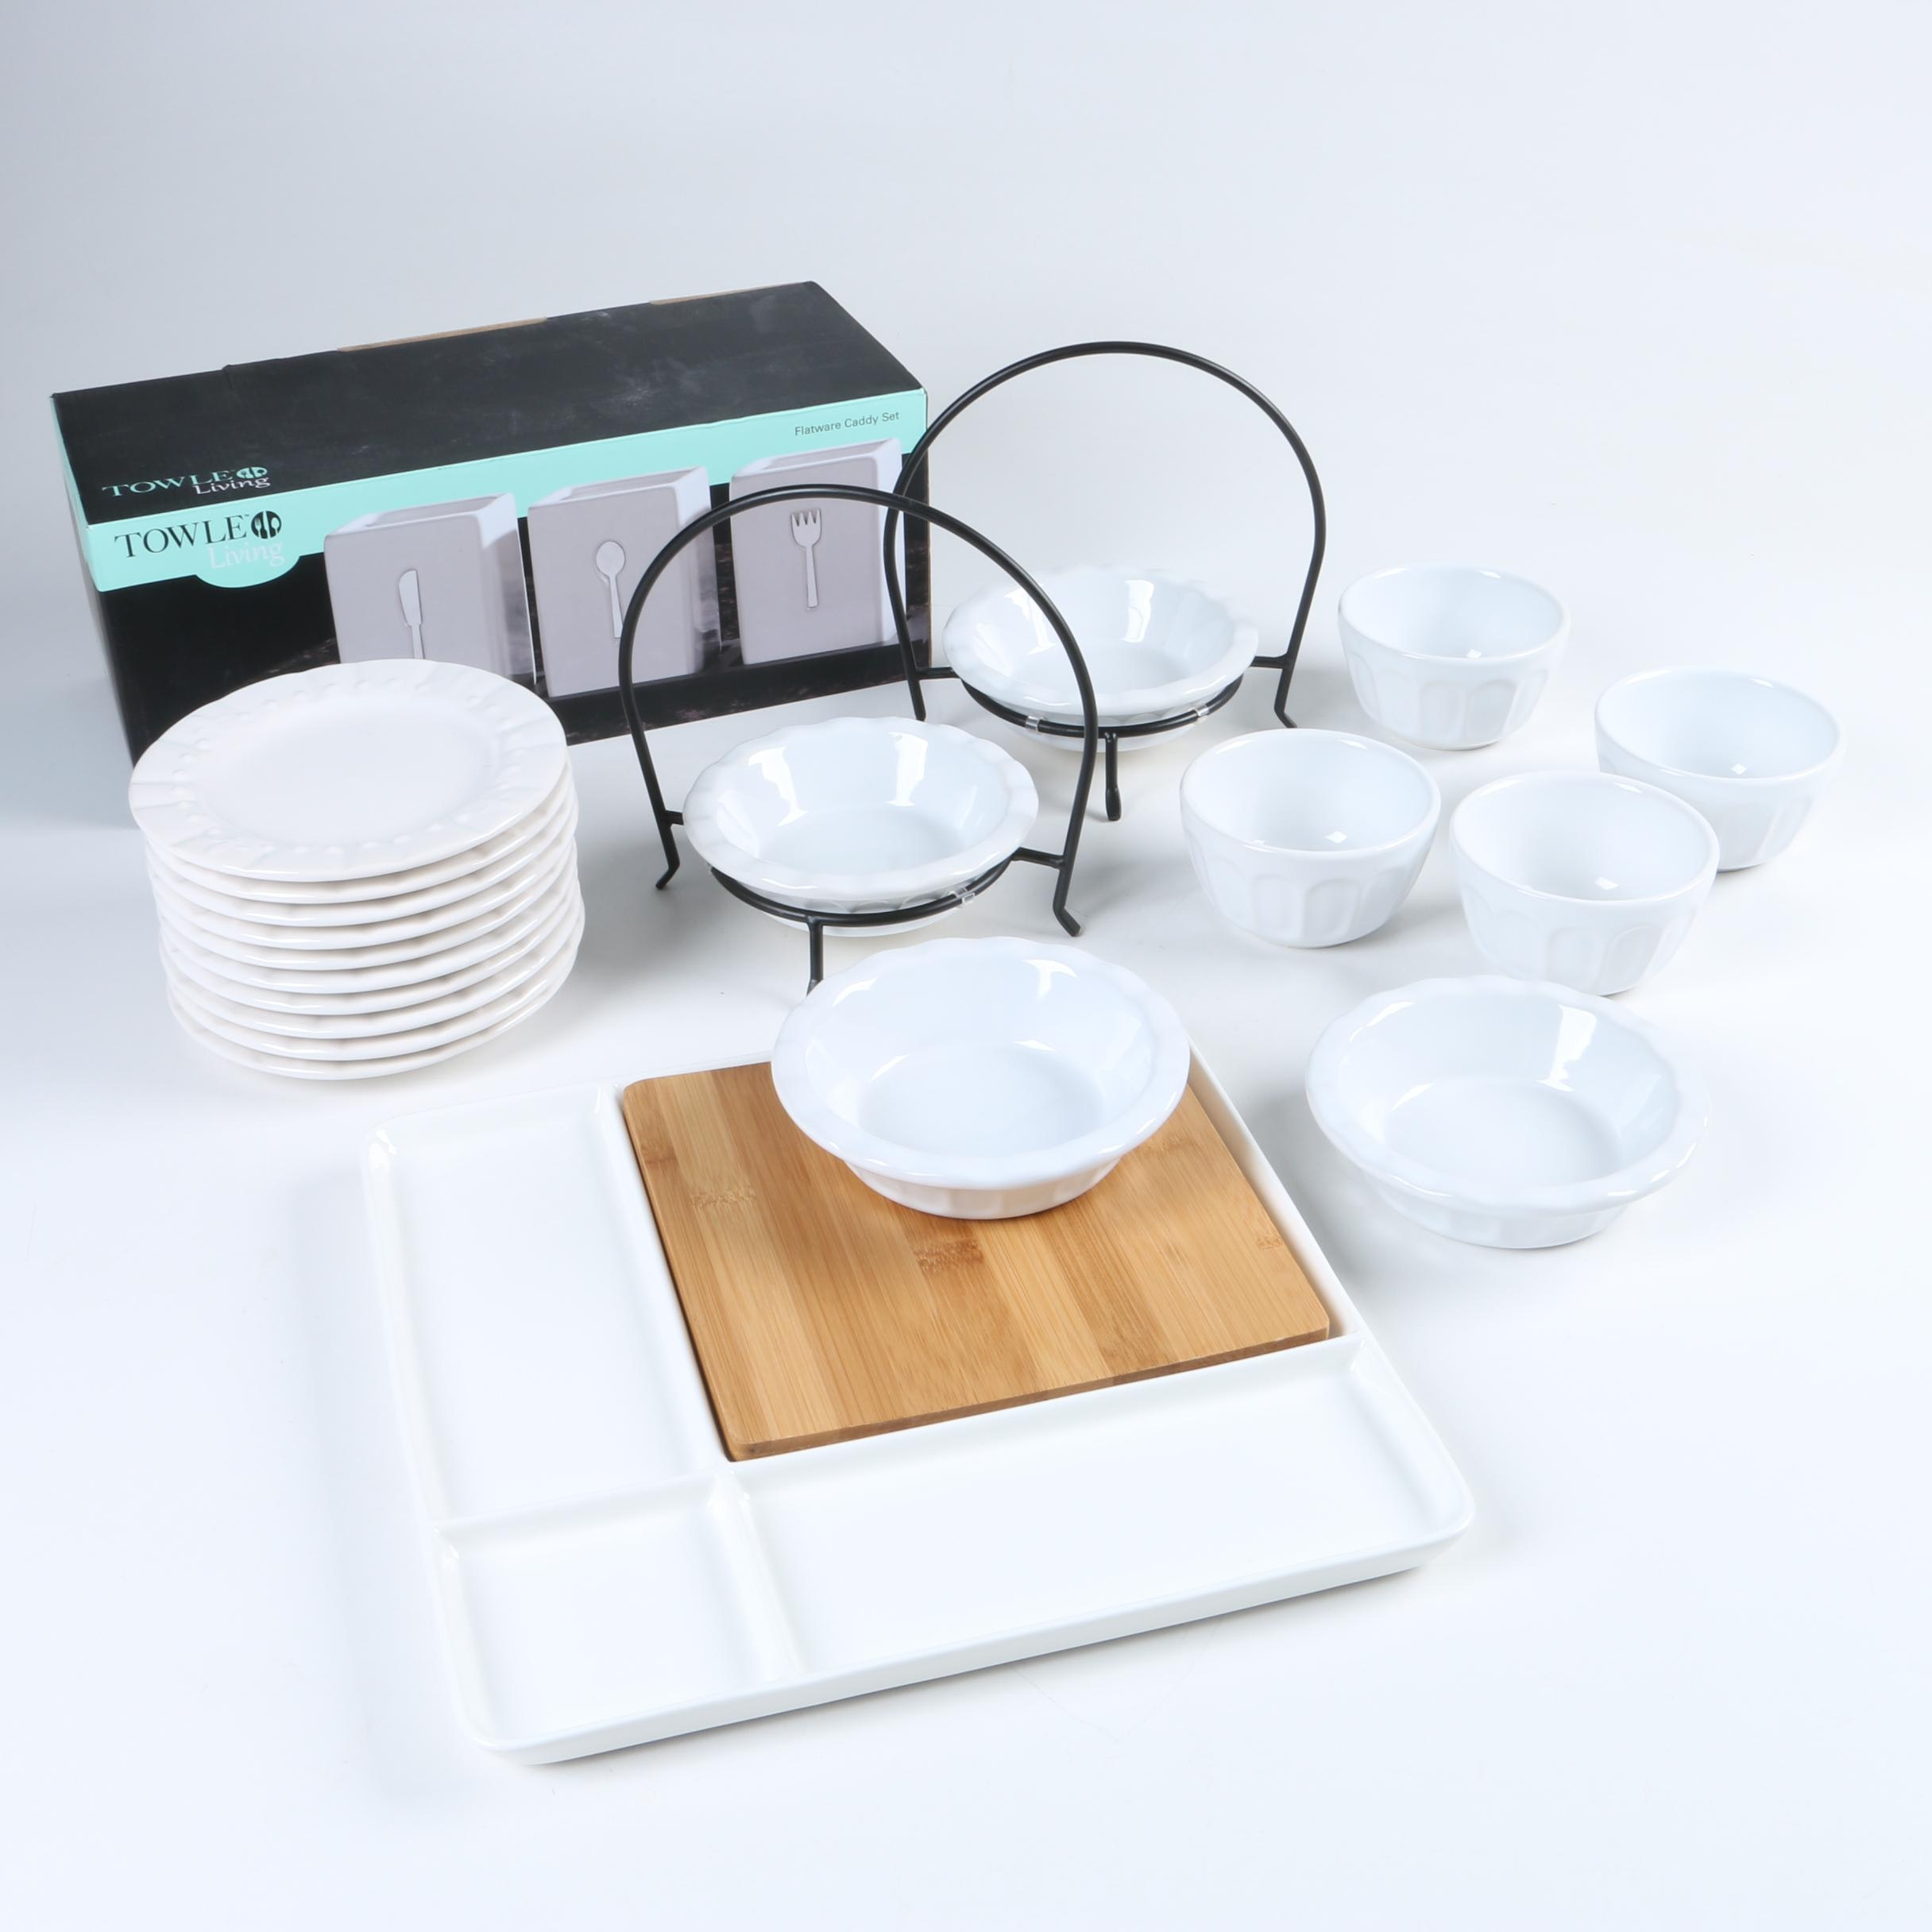 Contemporary Ceramic Tableware and Serveware